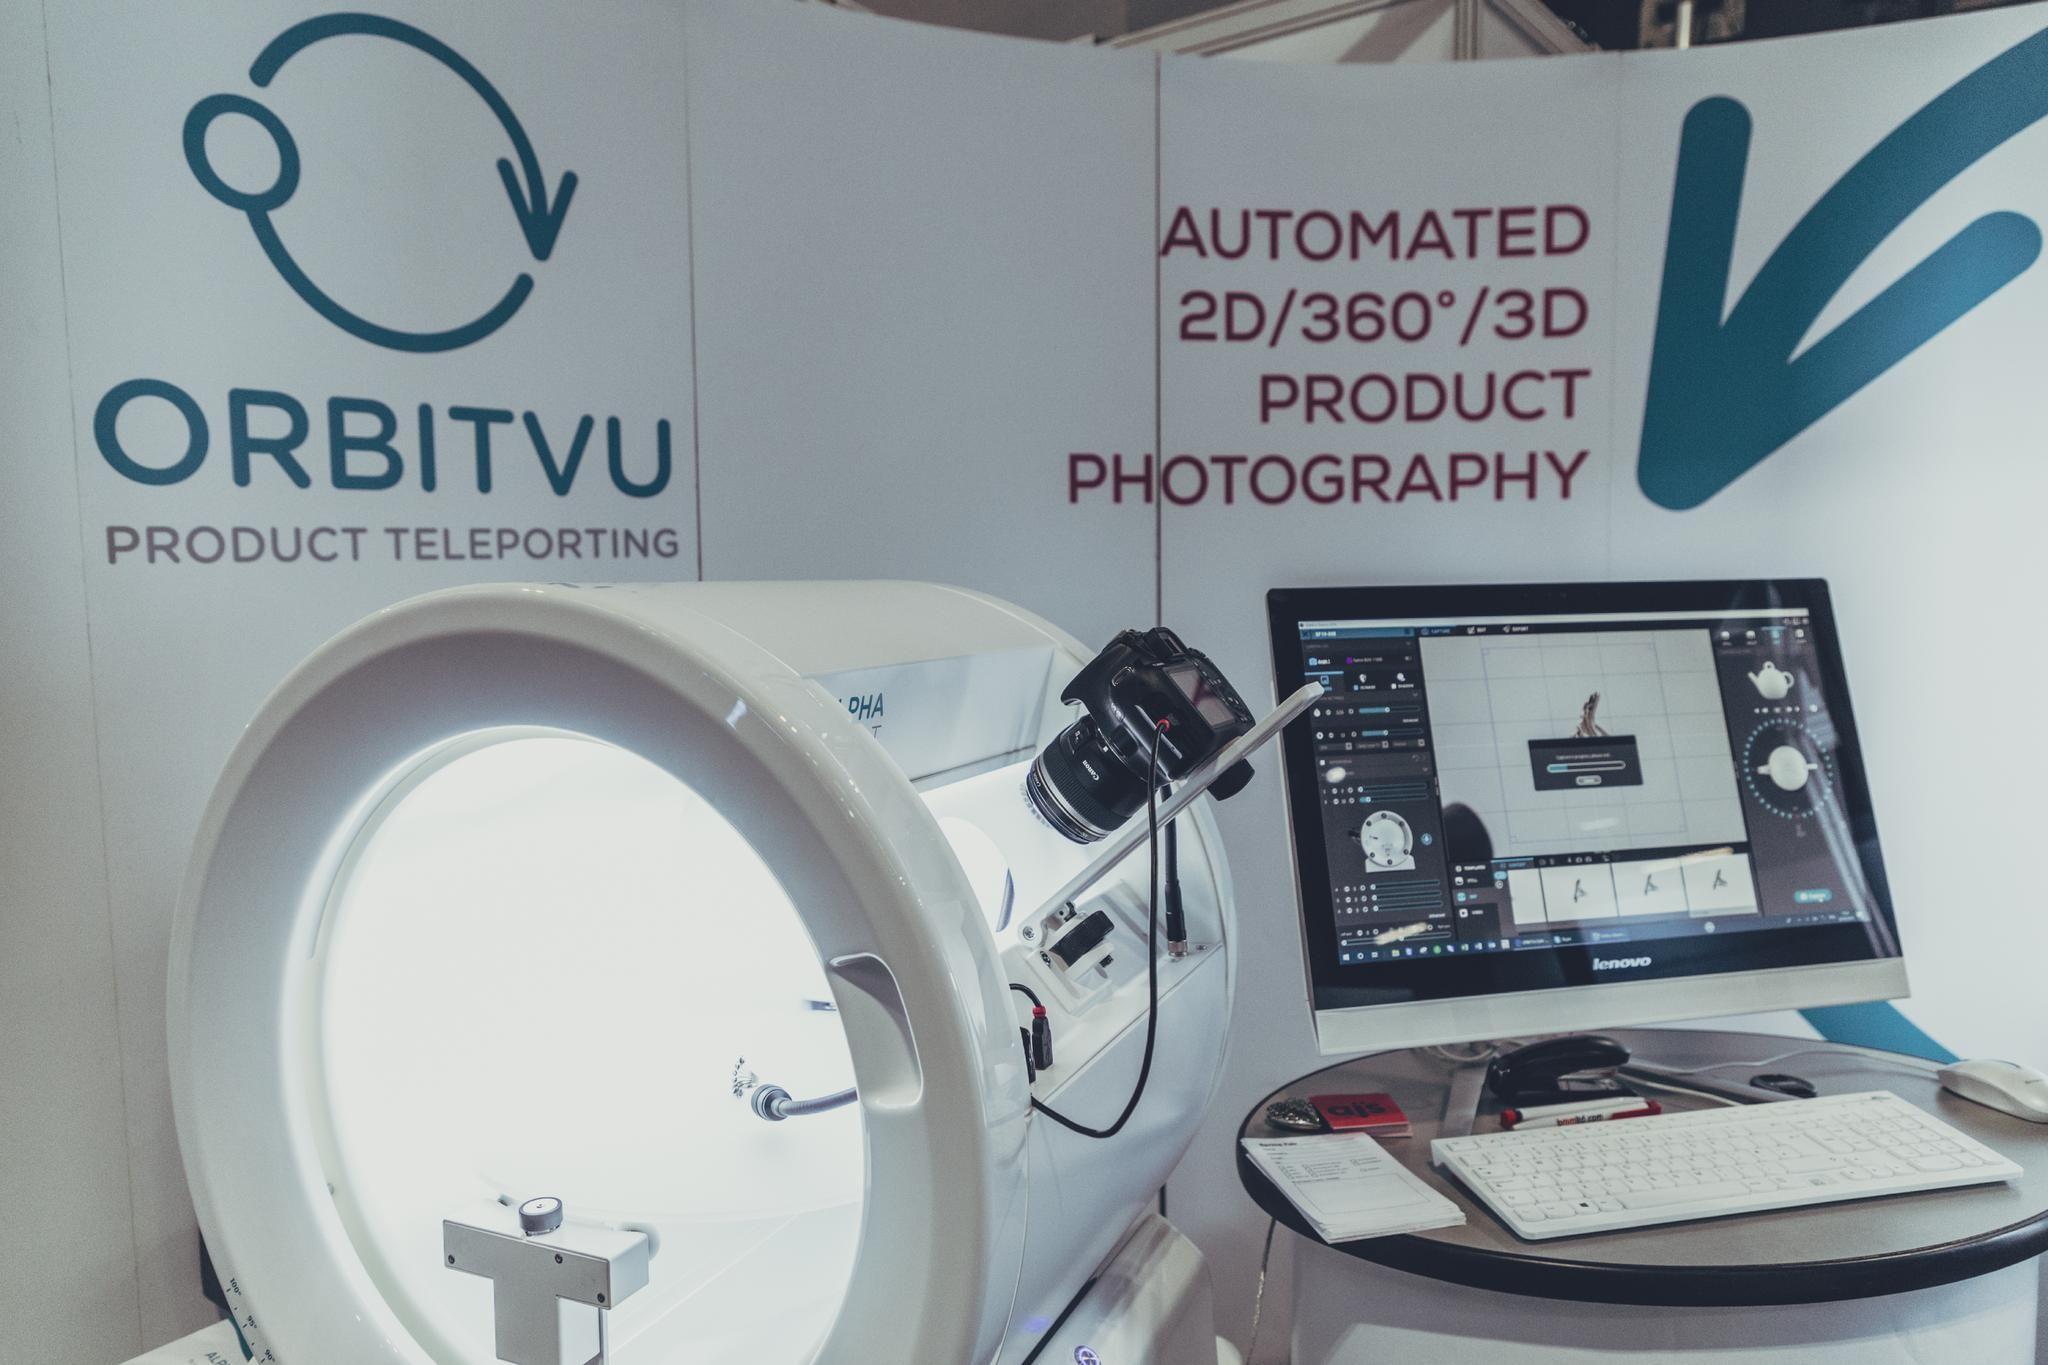 orbitvu product teleporting